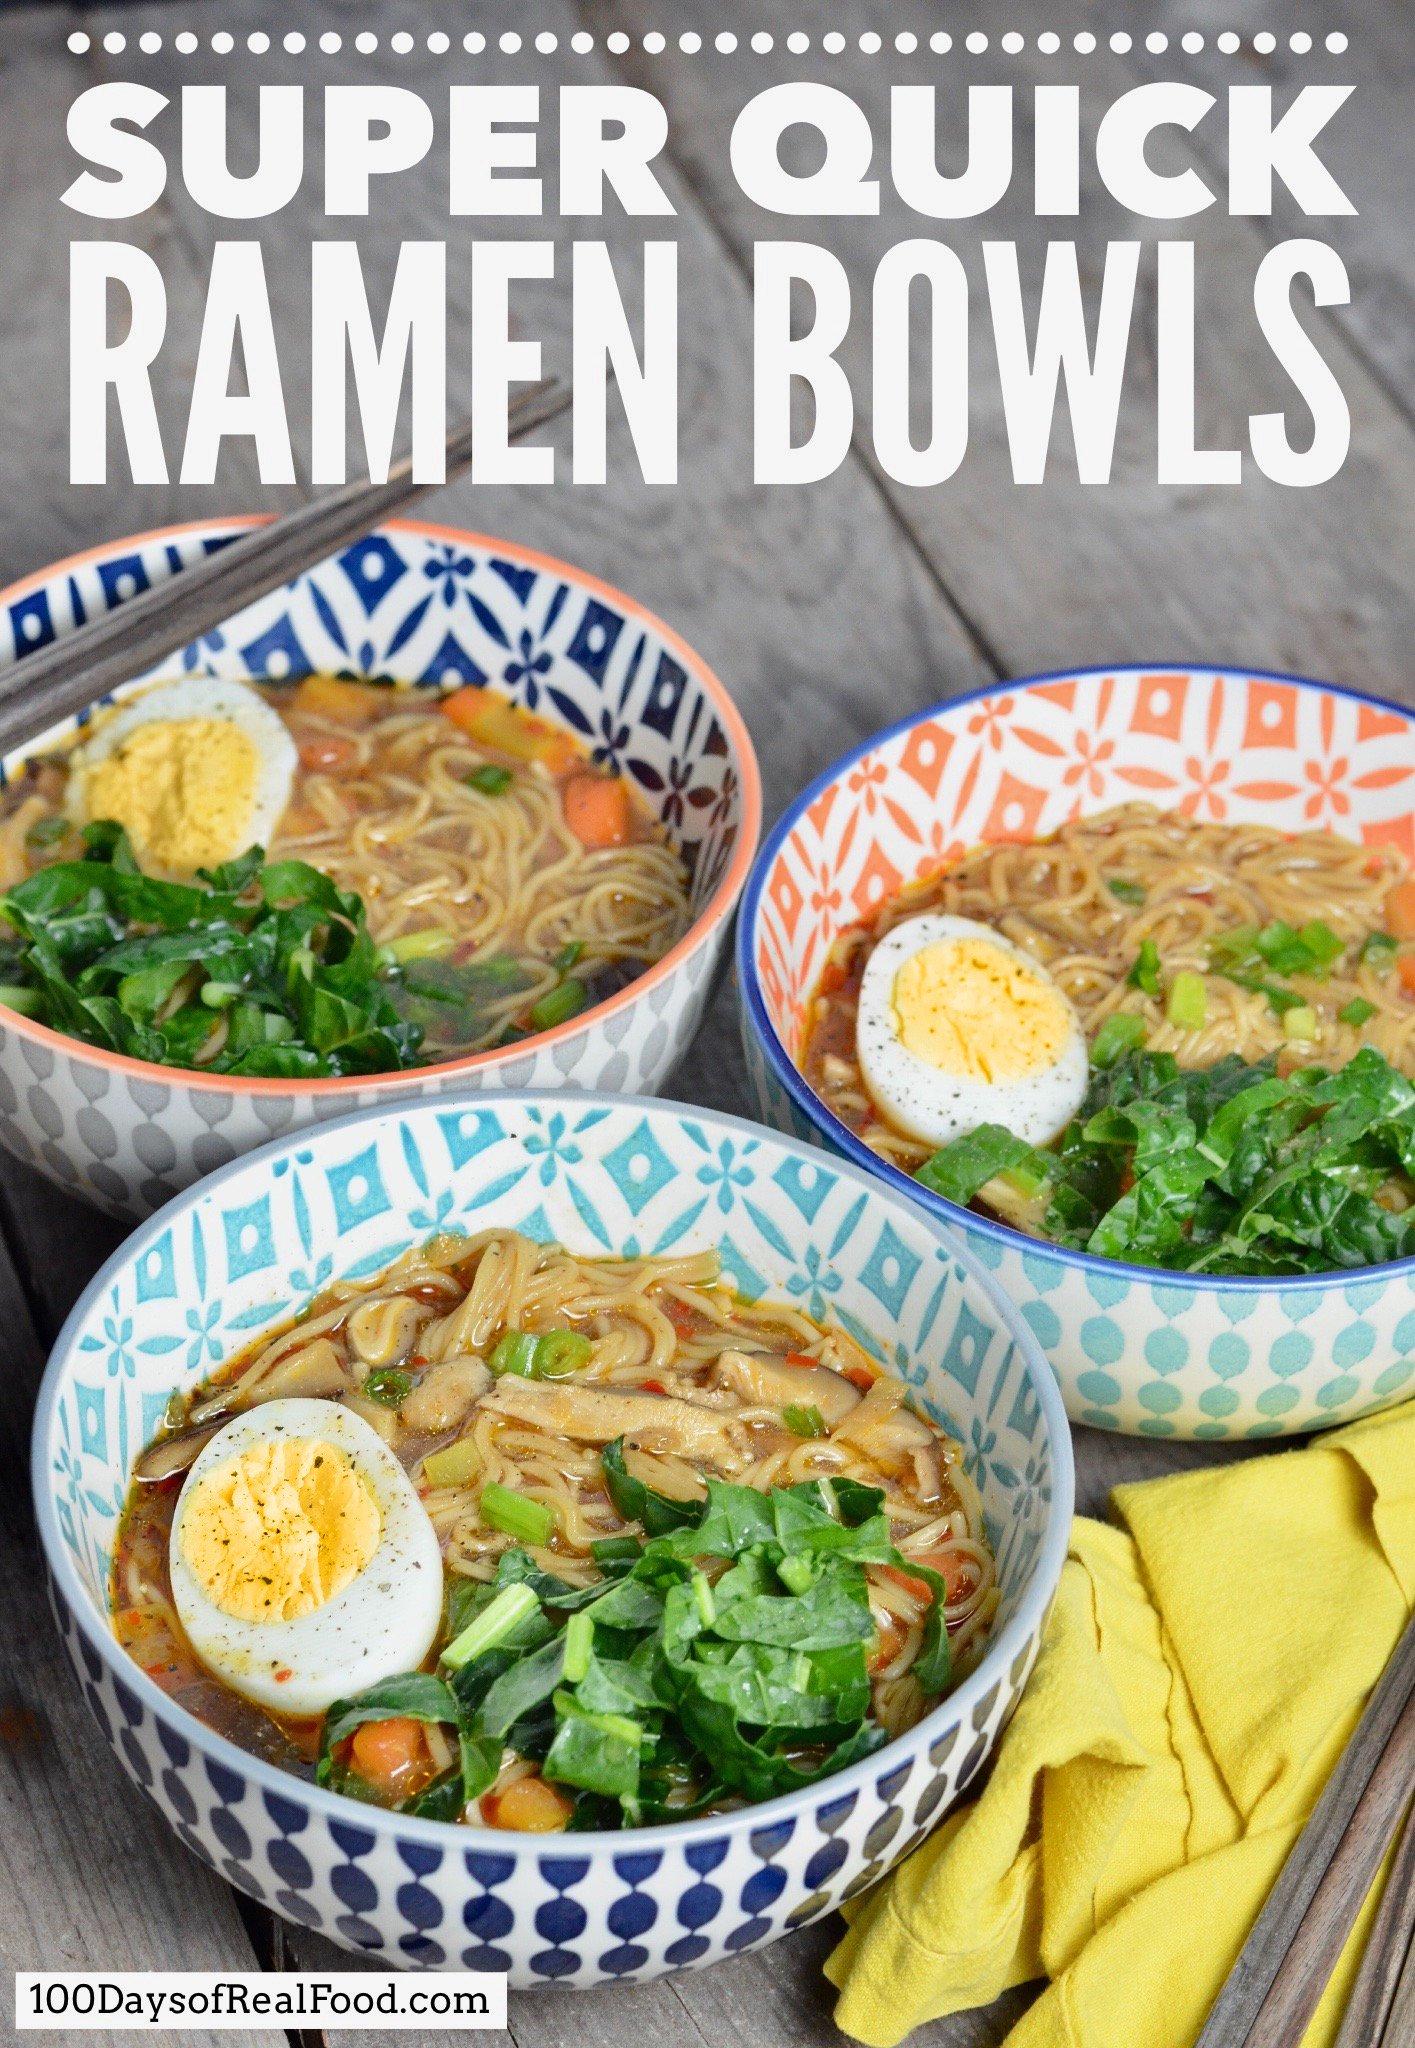 Three Ramen soups in vibrant colored bowls